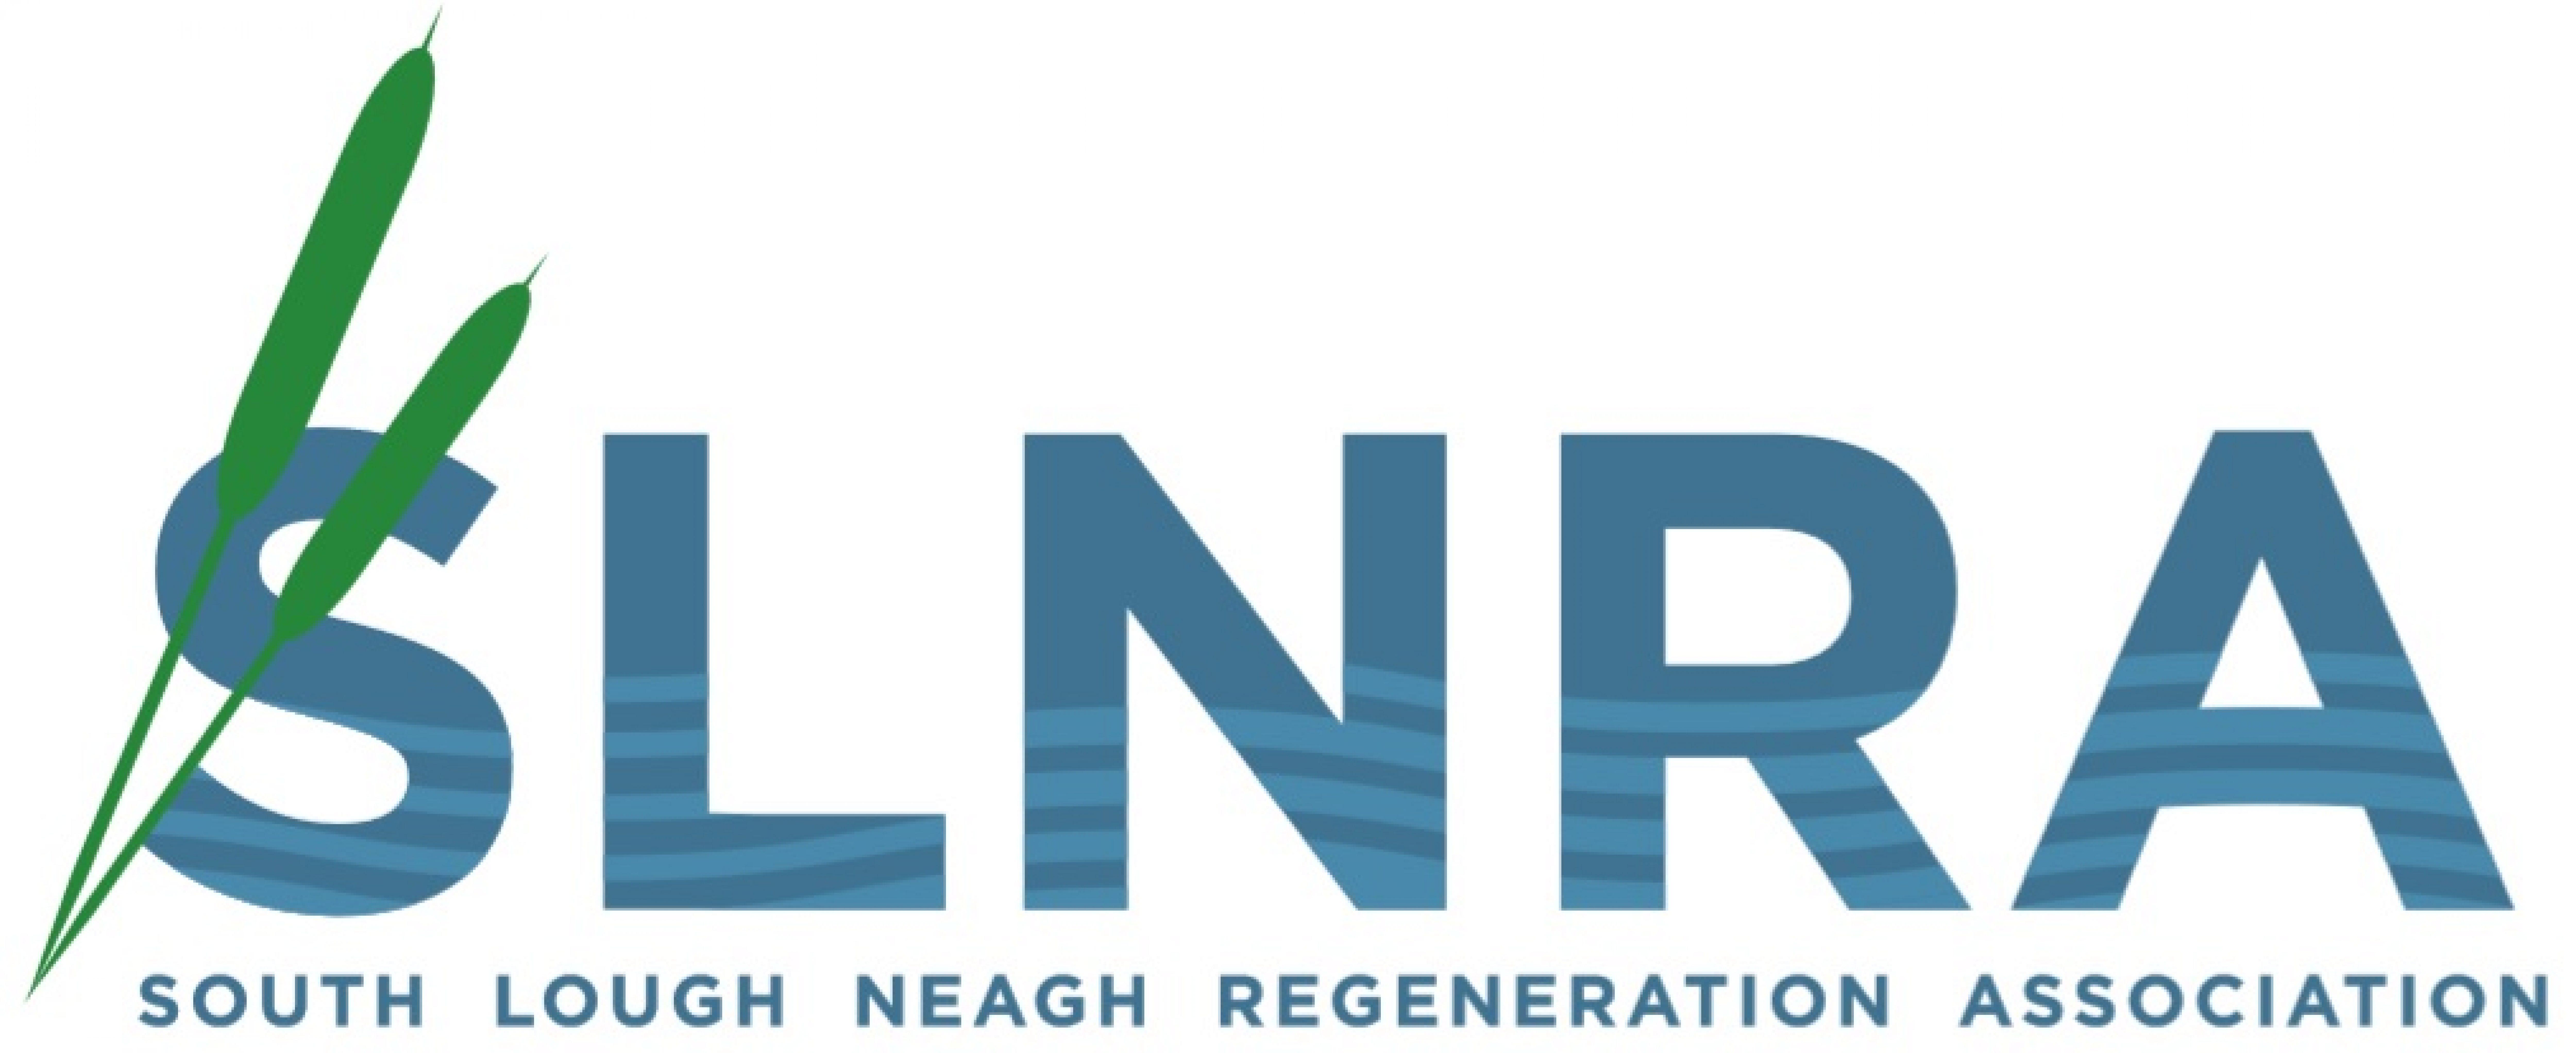 South Lough Neagh Regeneration Association